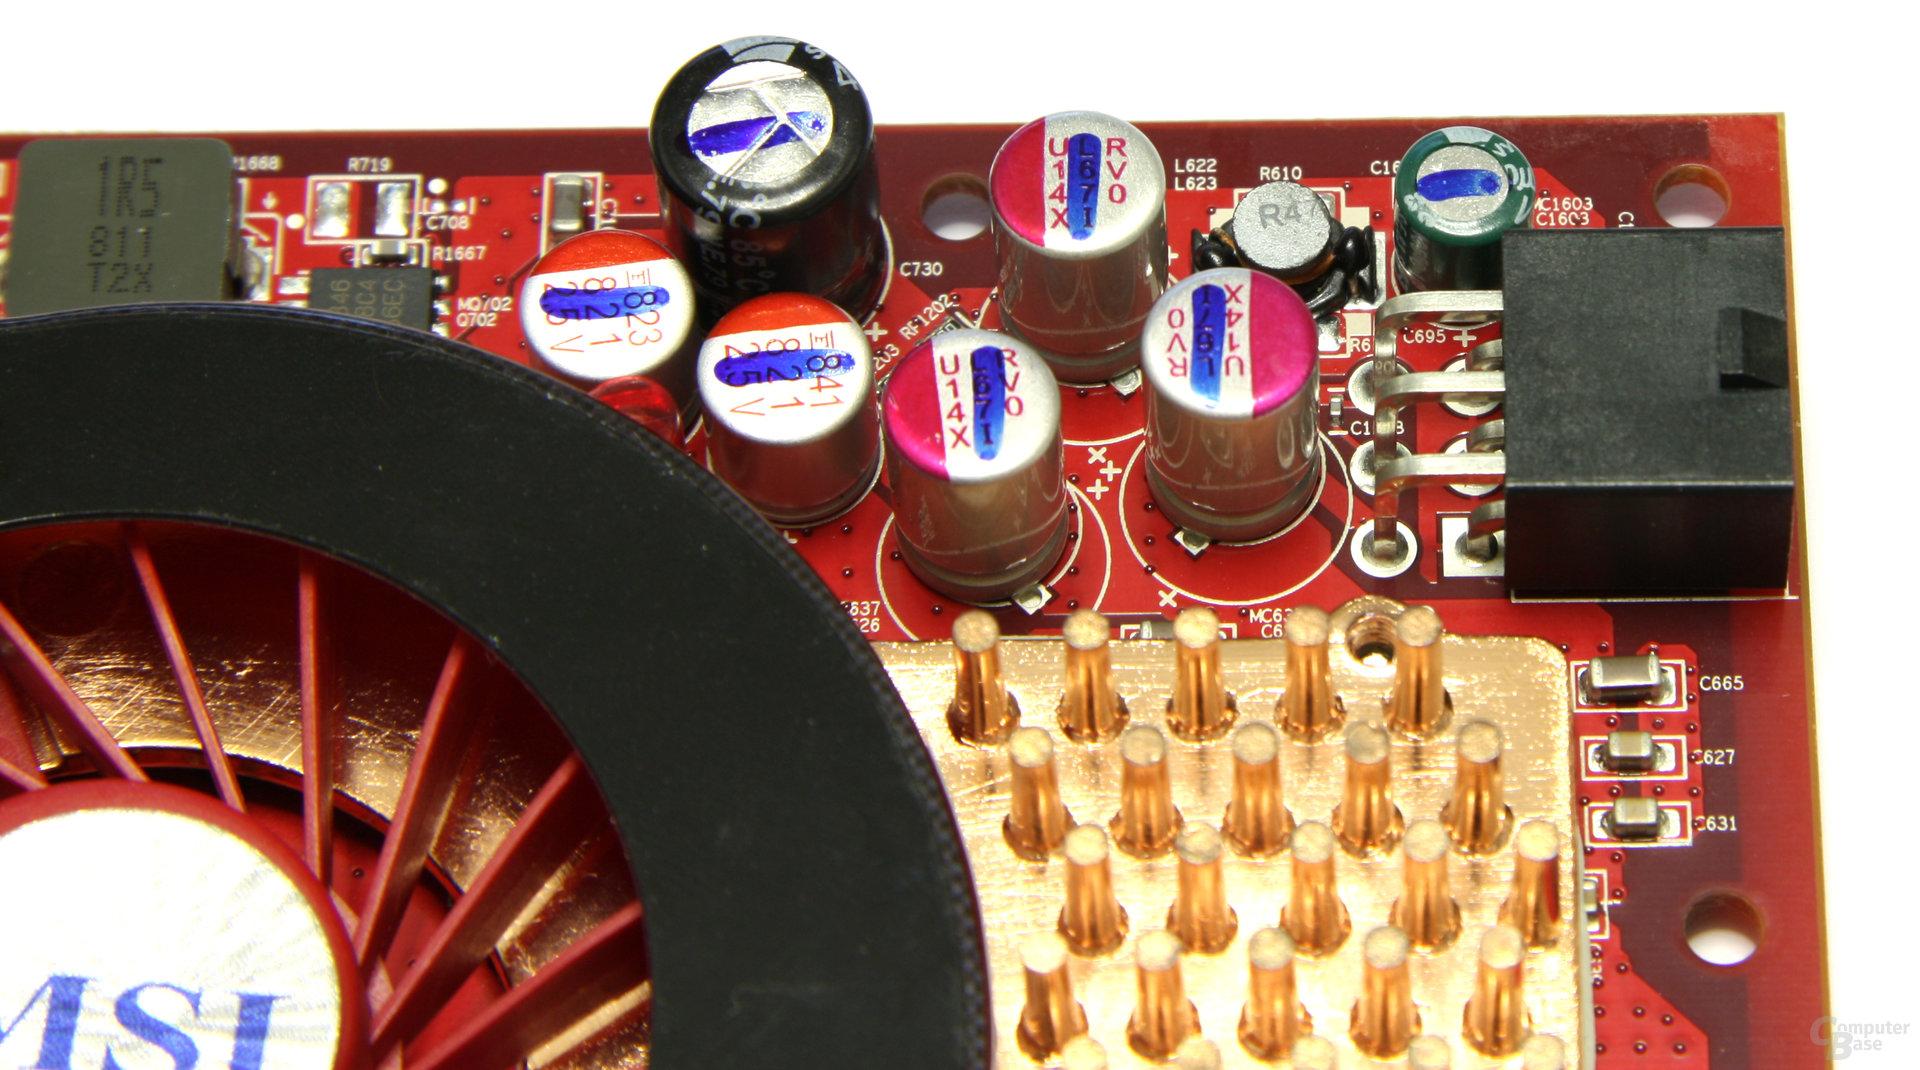 Radeon HD 4850 Stromanschluss